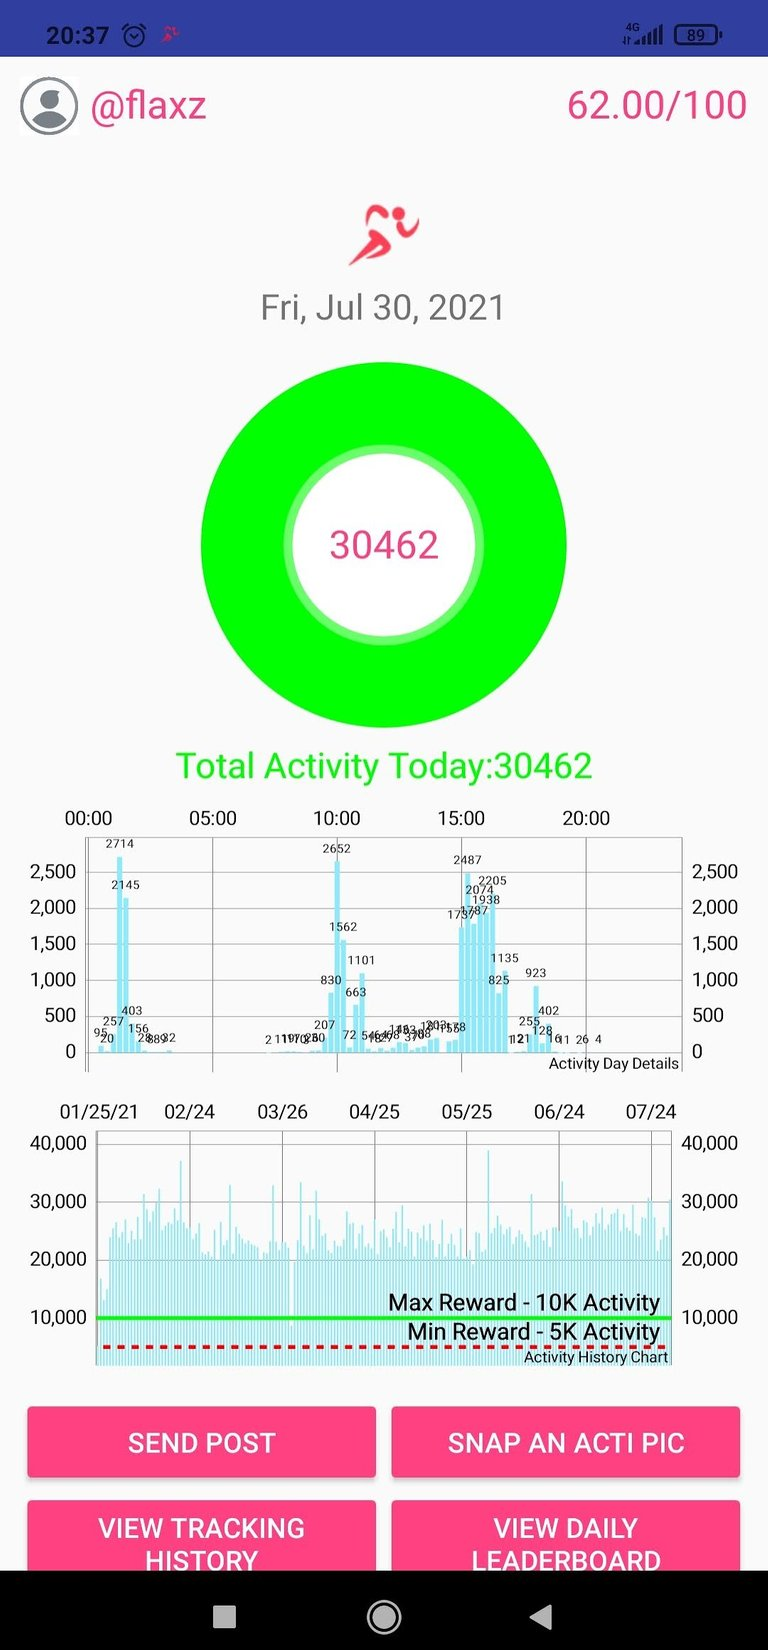 Screenshot_2021-07-30-20-37-56-371_io.actifit.fitnesstracker.actifitfitnesstracker.jpg